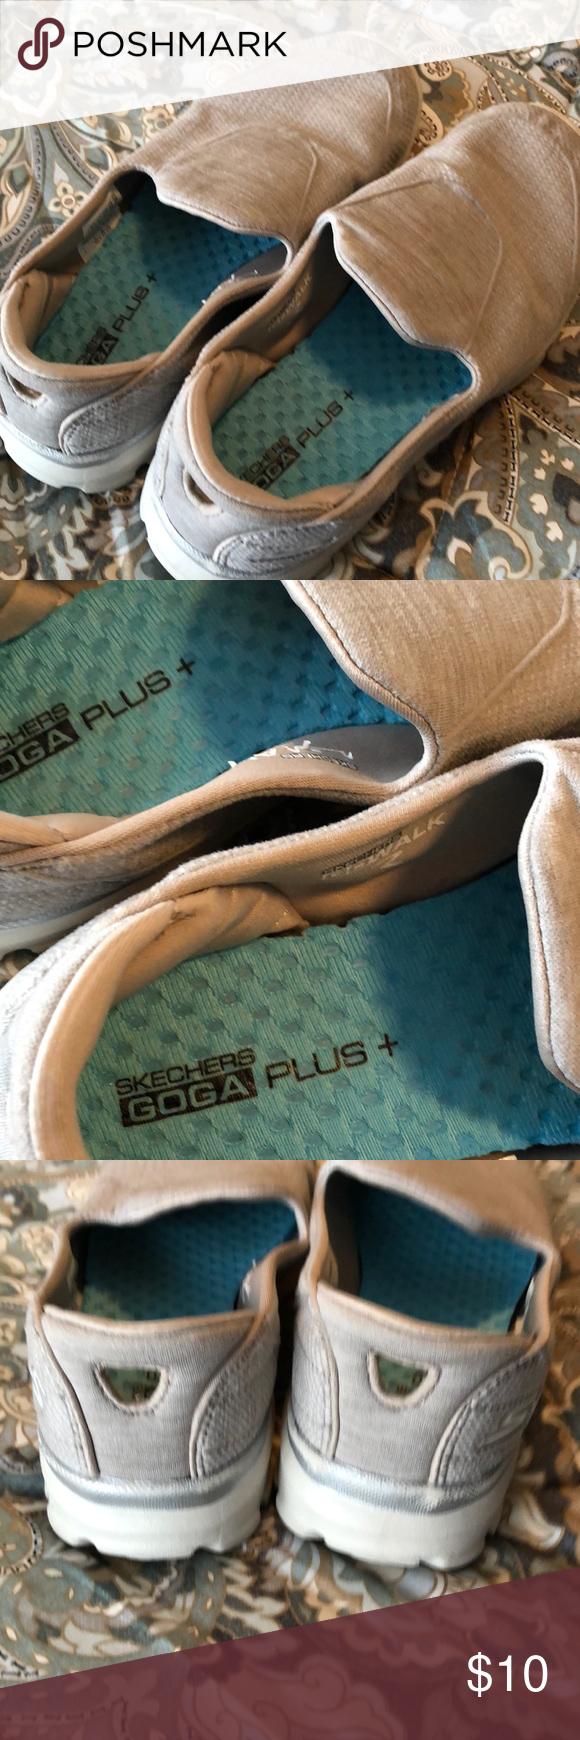 f3485b01de538 Sketchers GOGA Plus. Size 7 tan. Comfy! Super duper comfortable Sketchers.  Size 7. Lightly worn. Kinda of a taupe-ish color. The most comfortable shoe!